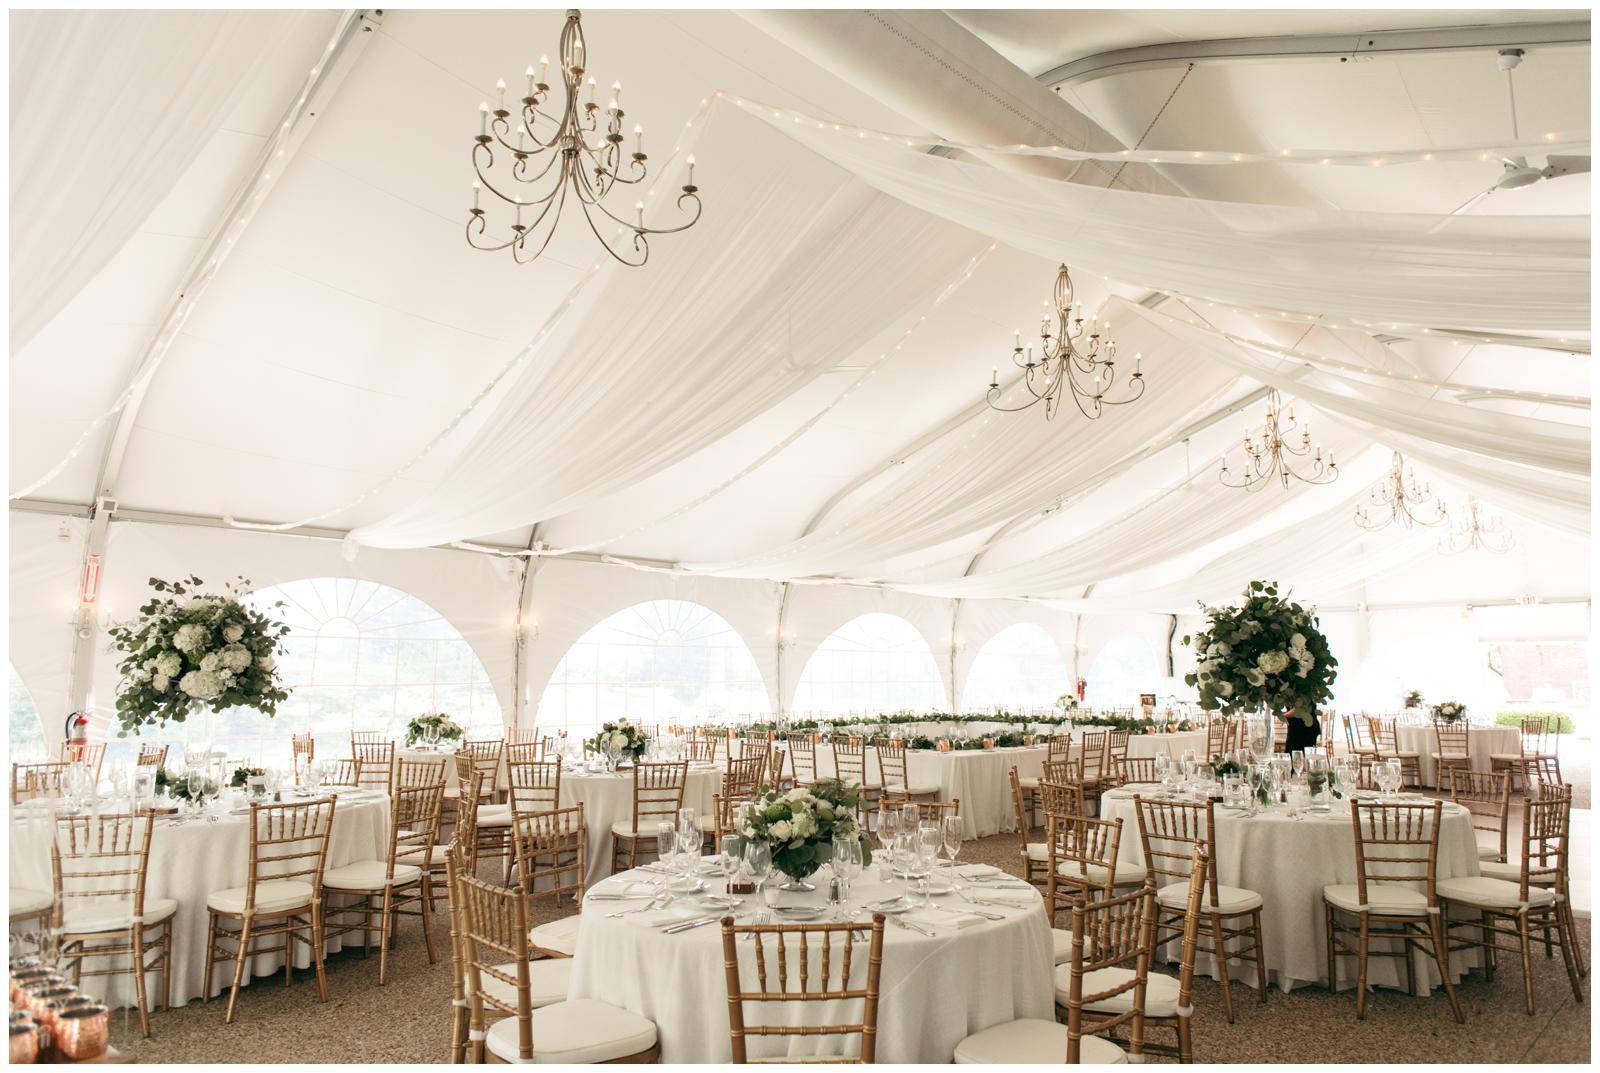 tented wedding venue Massachusetts